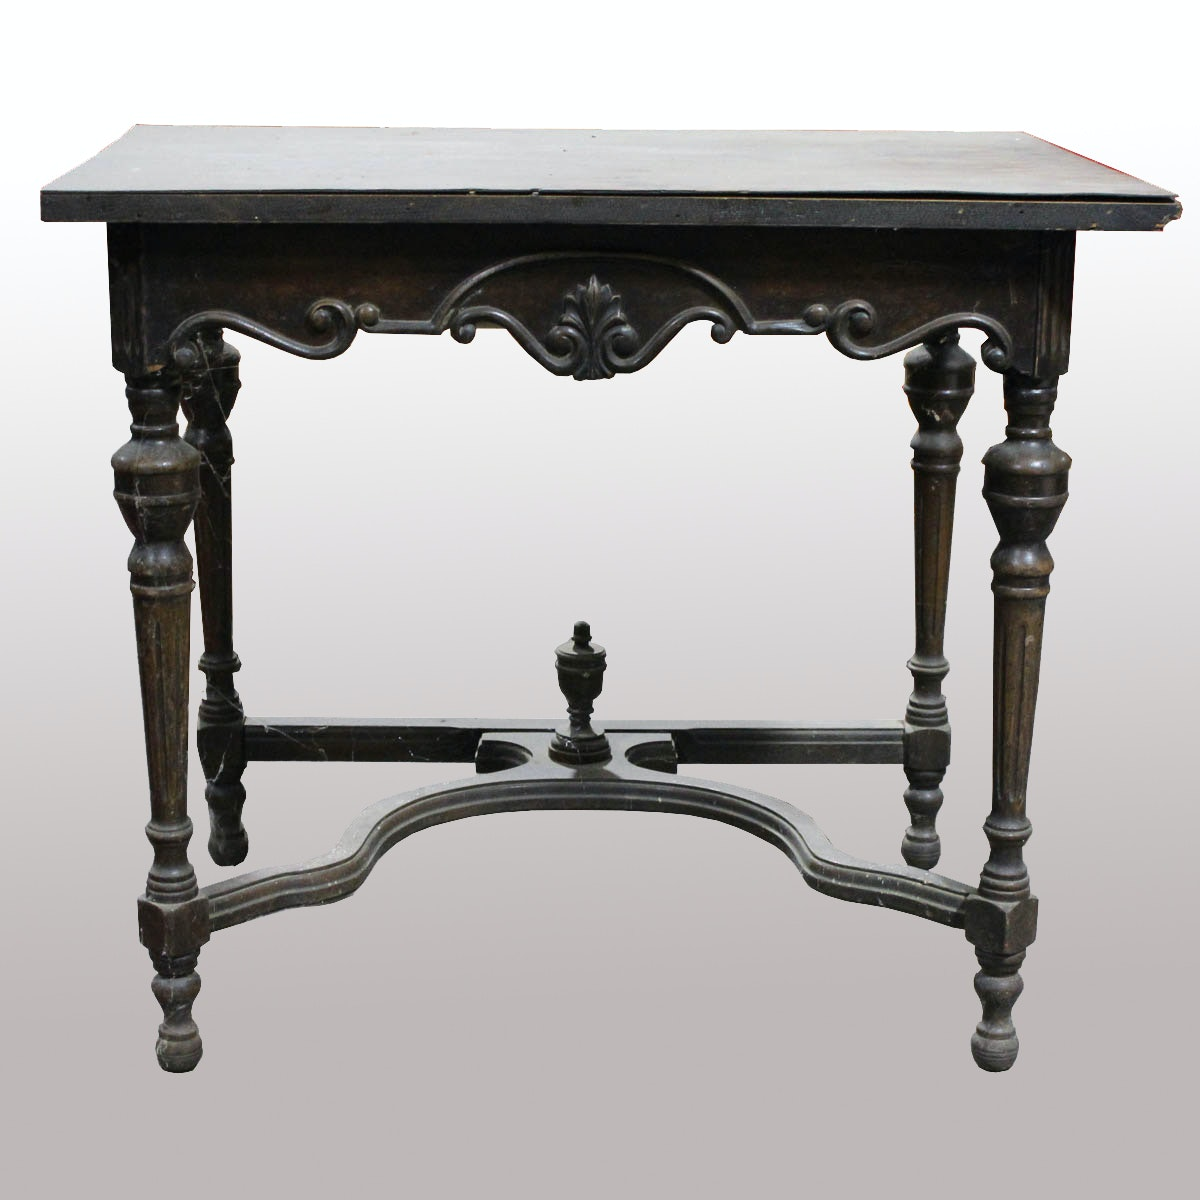 Vintage Italian Renaissance Revival Style Wooded Table